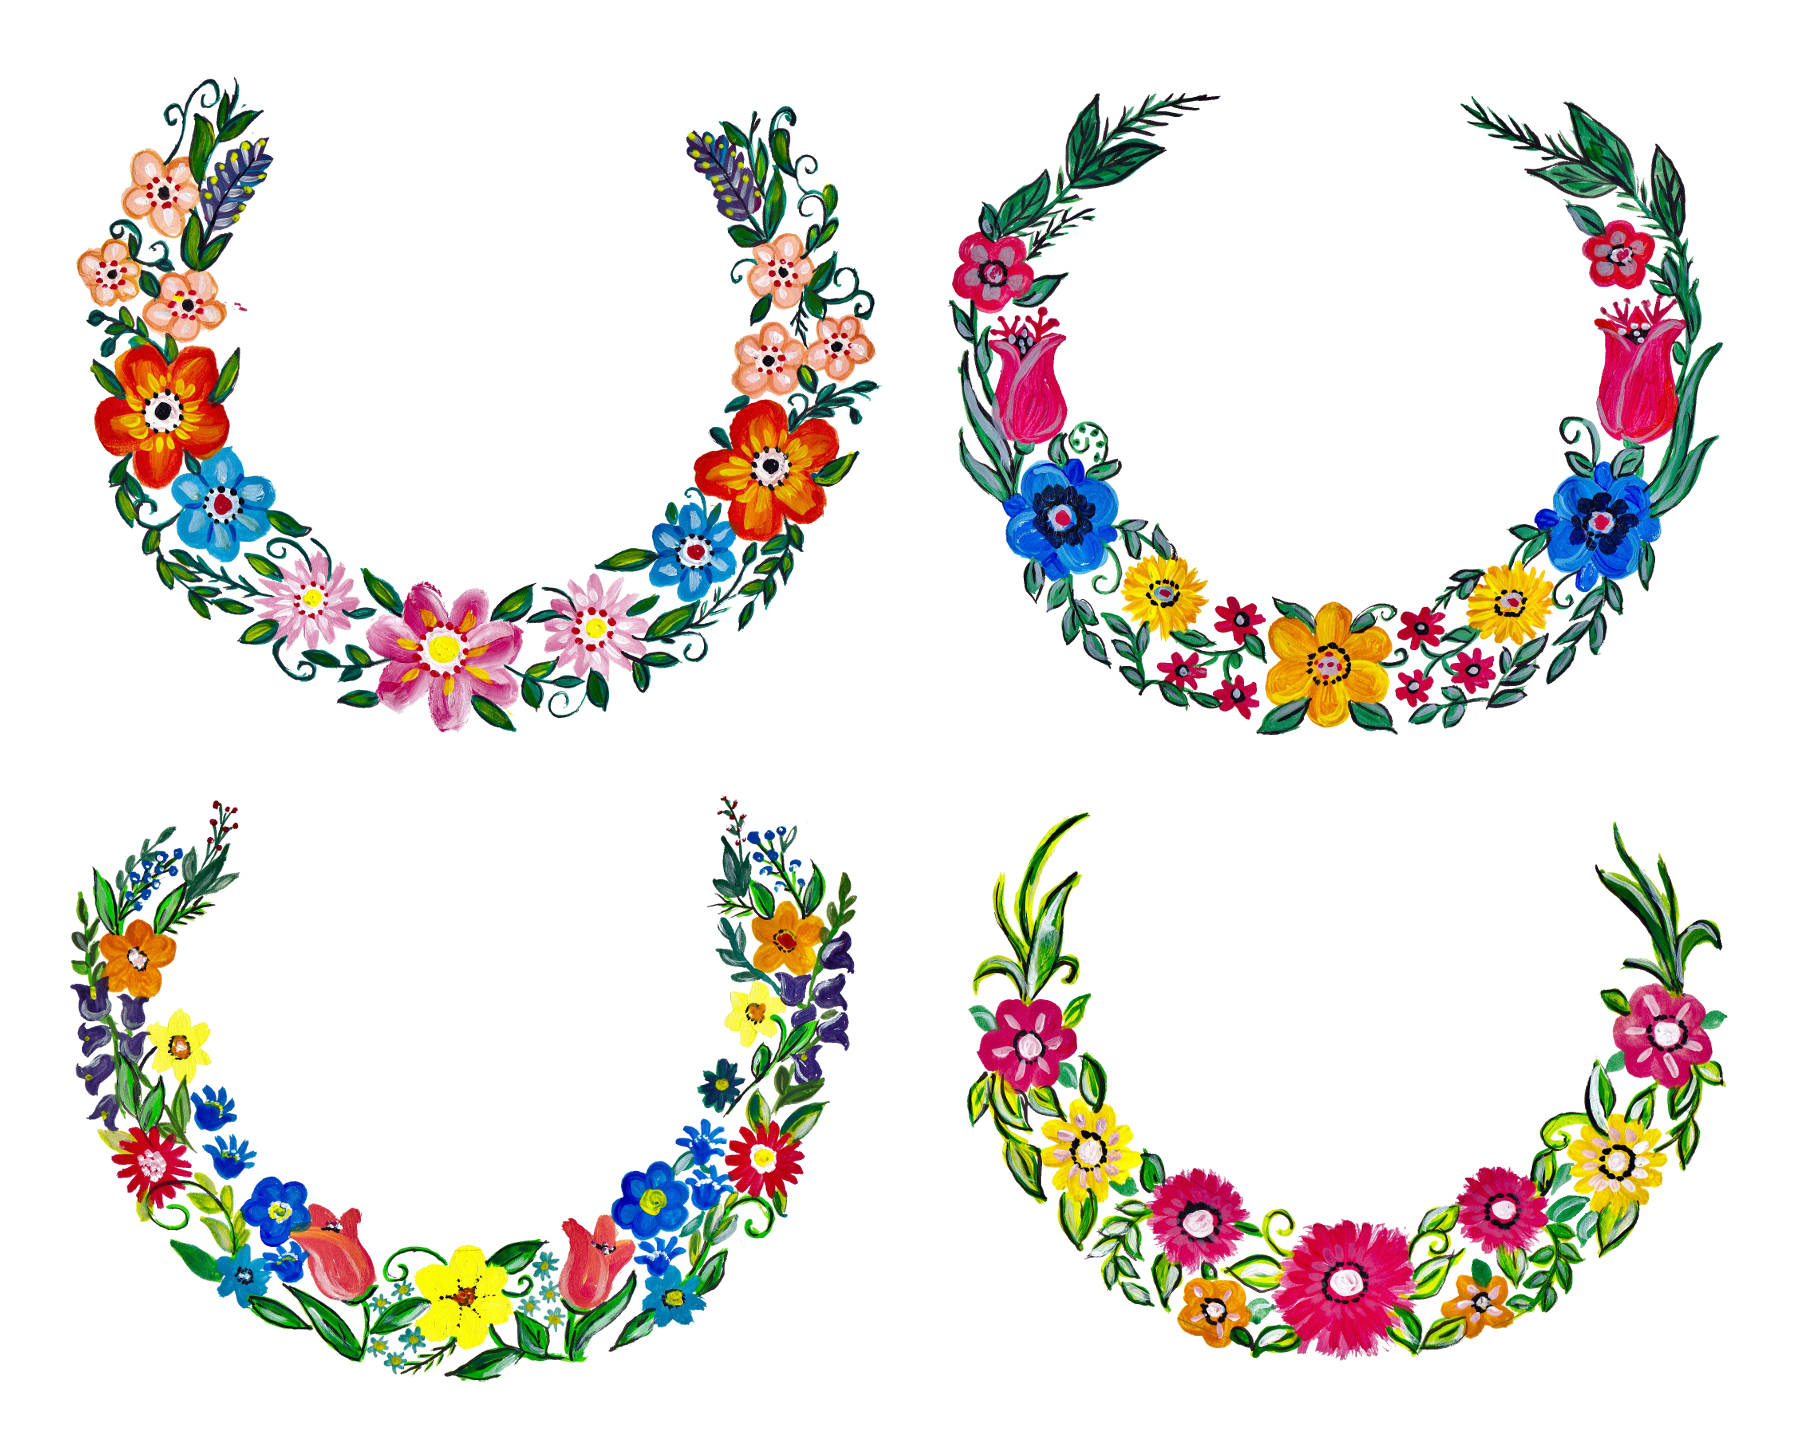 4-flower-wreath-painting-cover.jpg